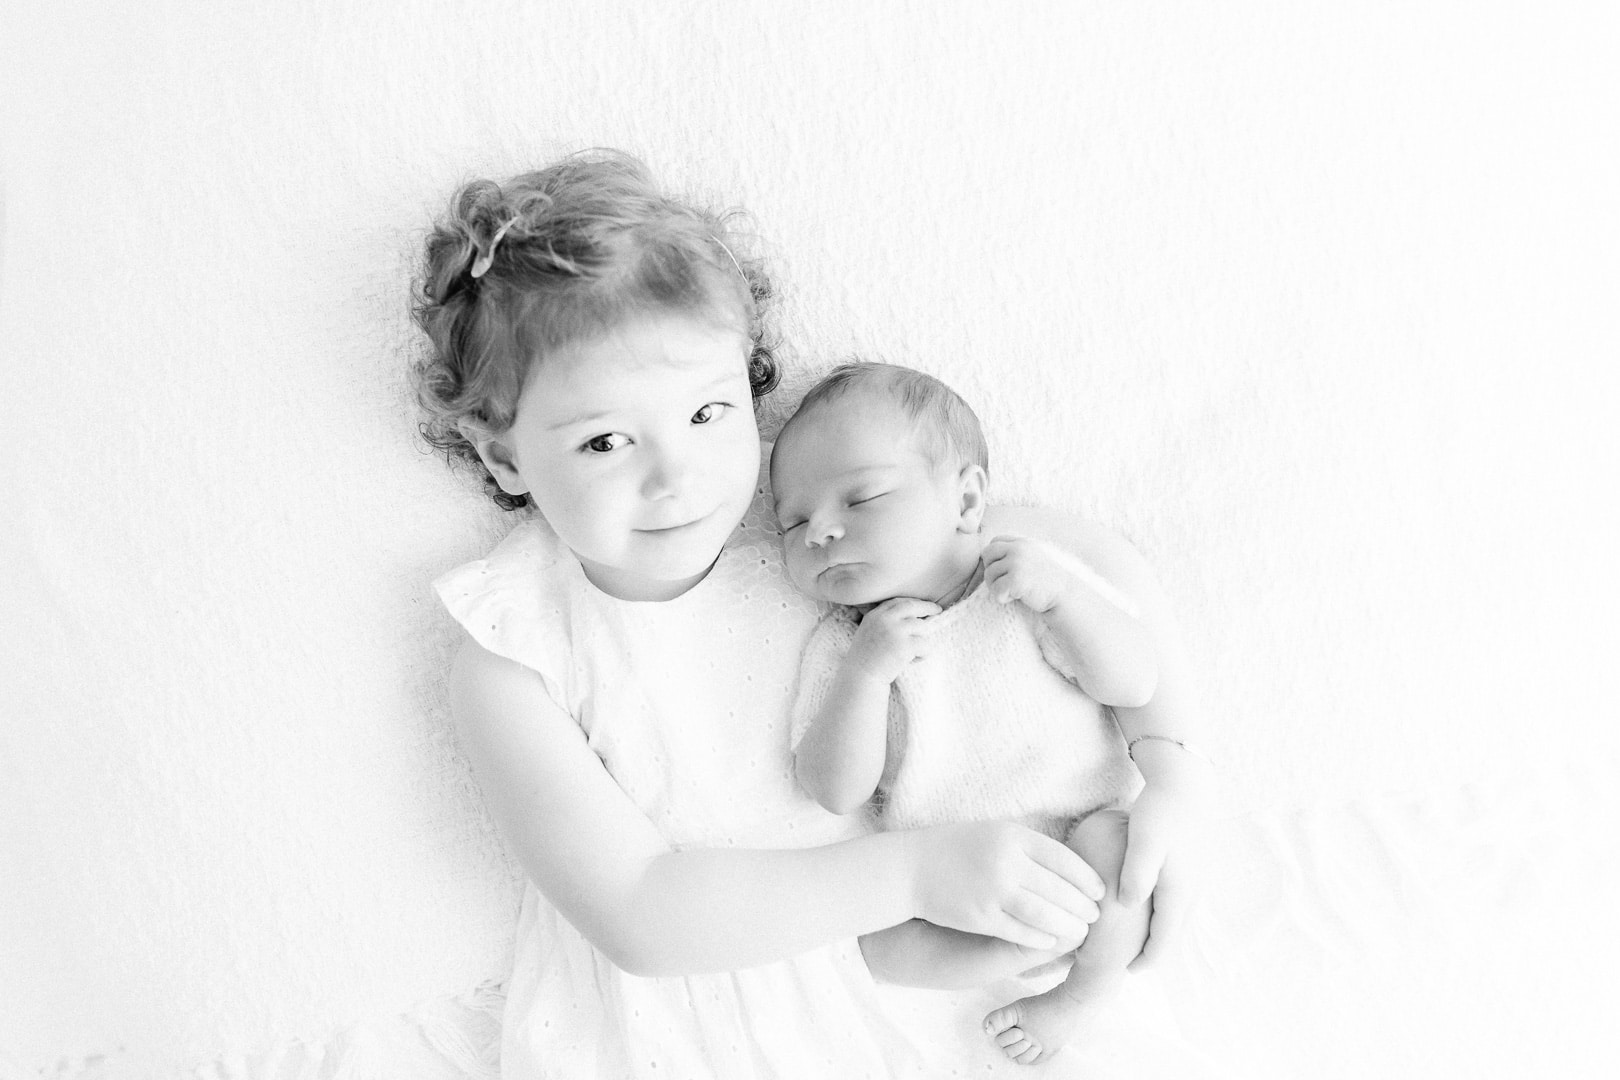 baby photographer Lausanne,  photographe nyon, newborn photographer, Nyon, maternity photographer, Nyon, Lausanne, Gland, Coppet, natural, white session, session maternité, workshop, formation